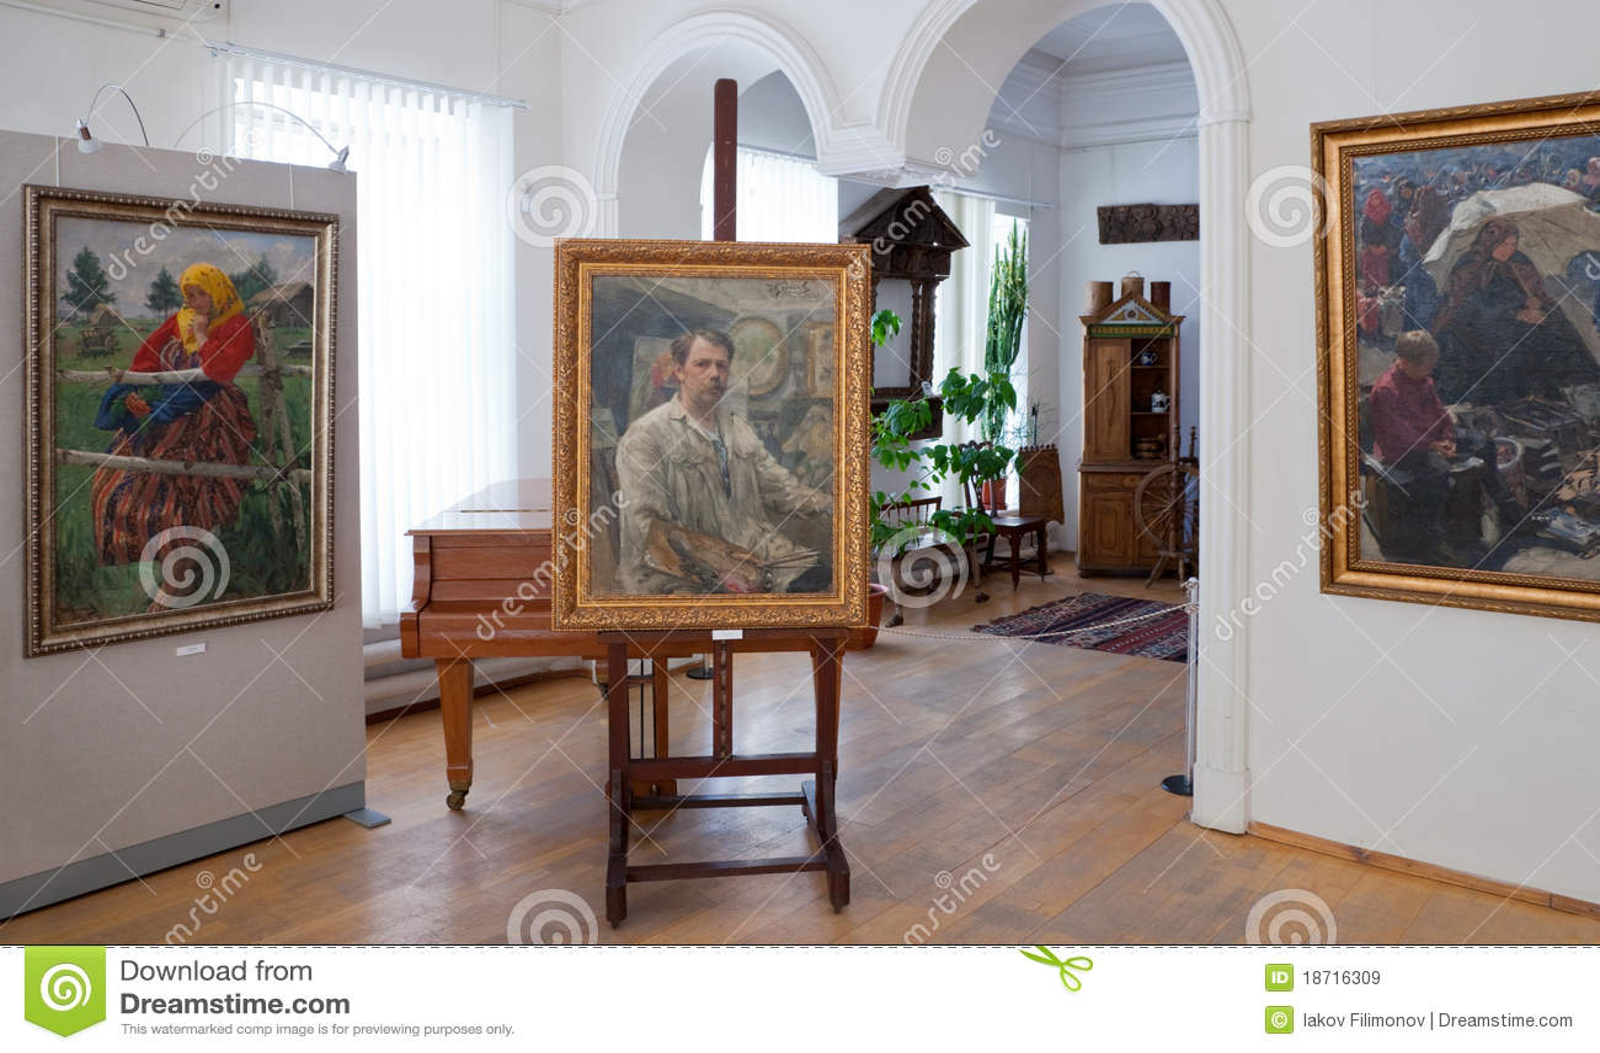 1875 1941 artysty galery ivan kulikov